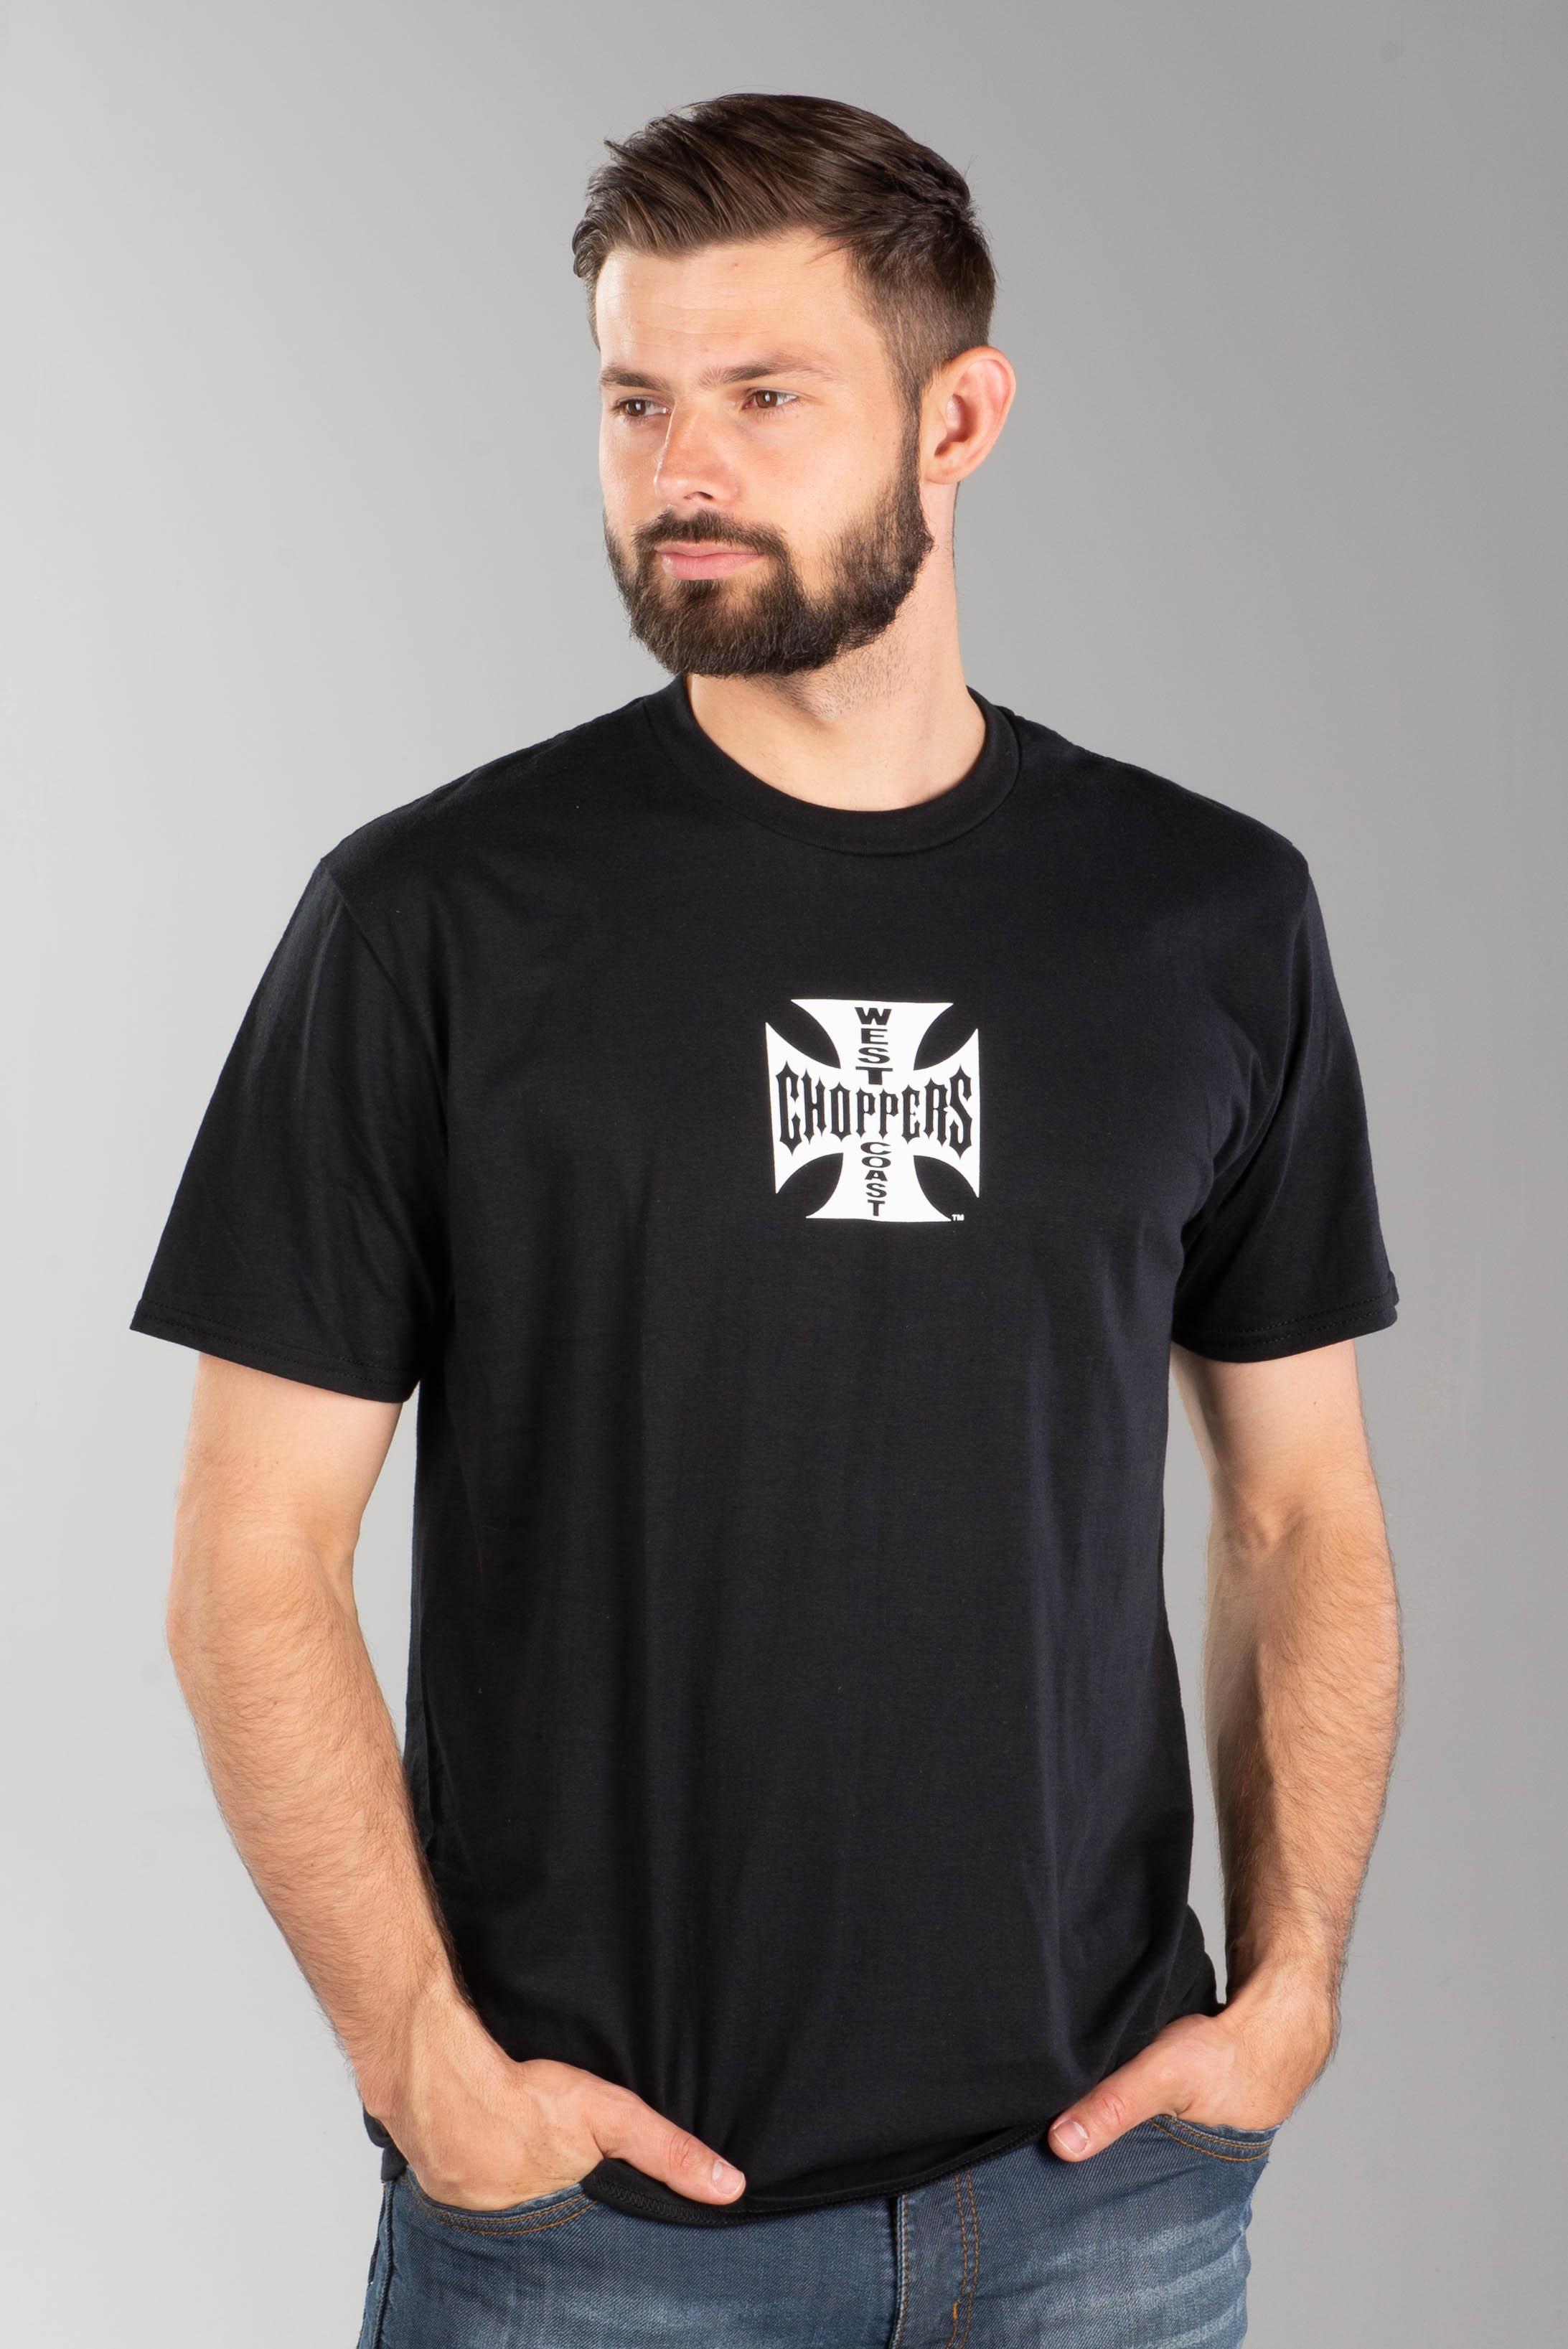 Poubelle Band Logo Plein Coton Noir T Shirt.